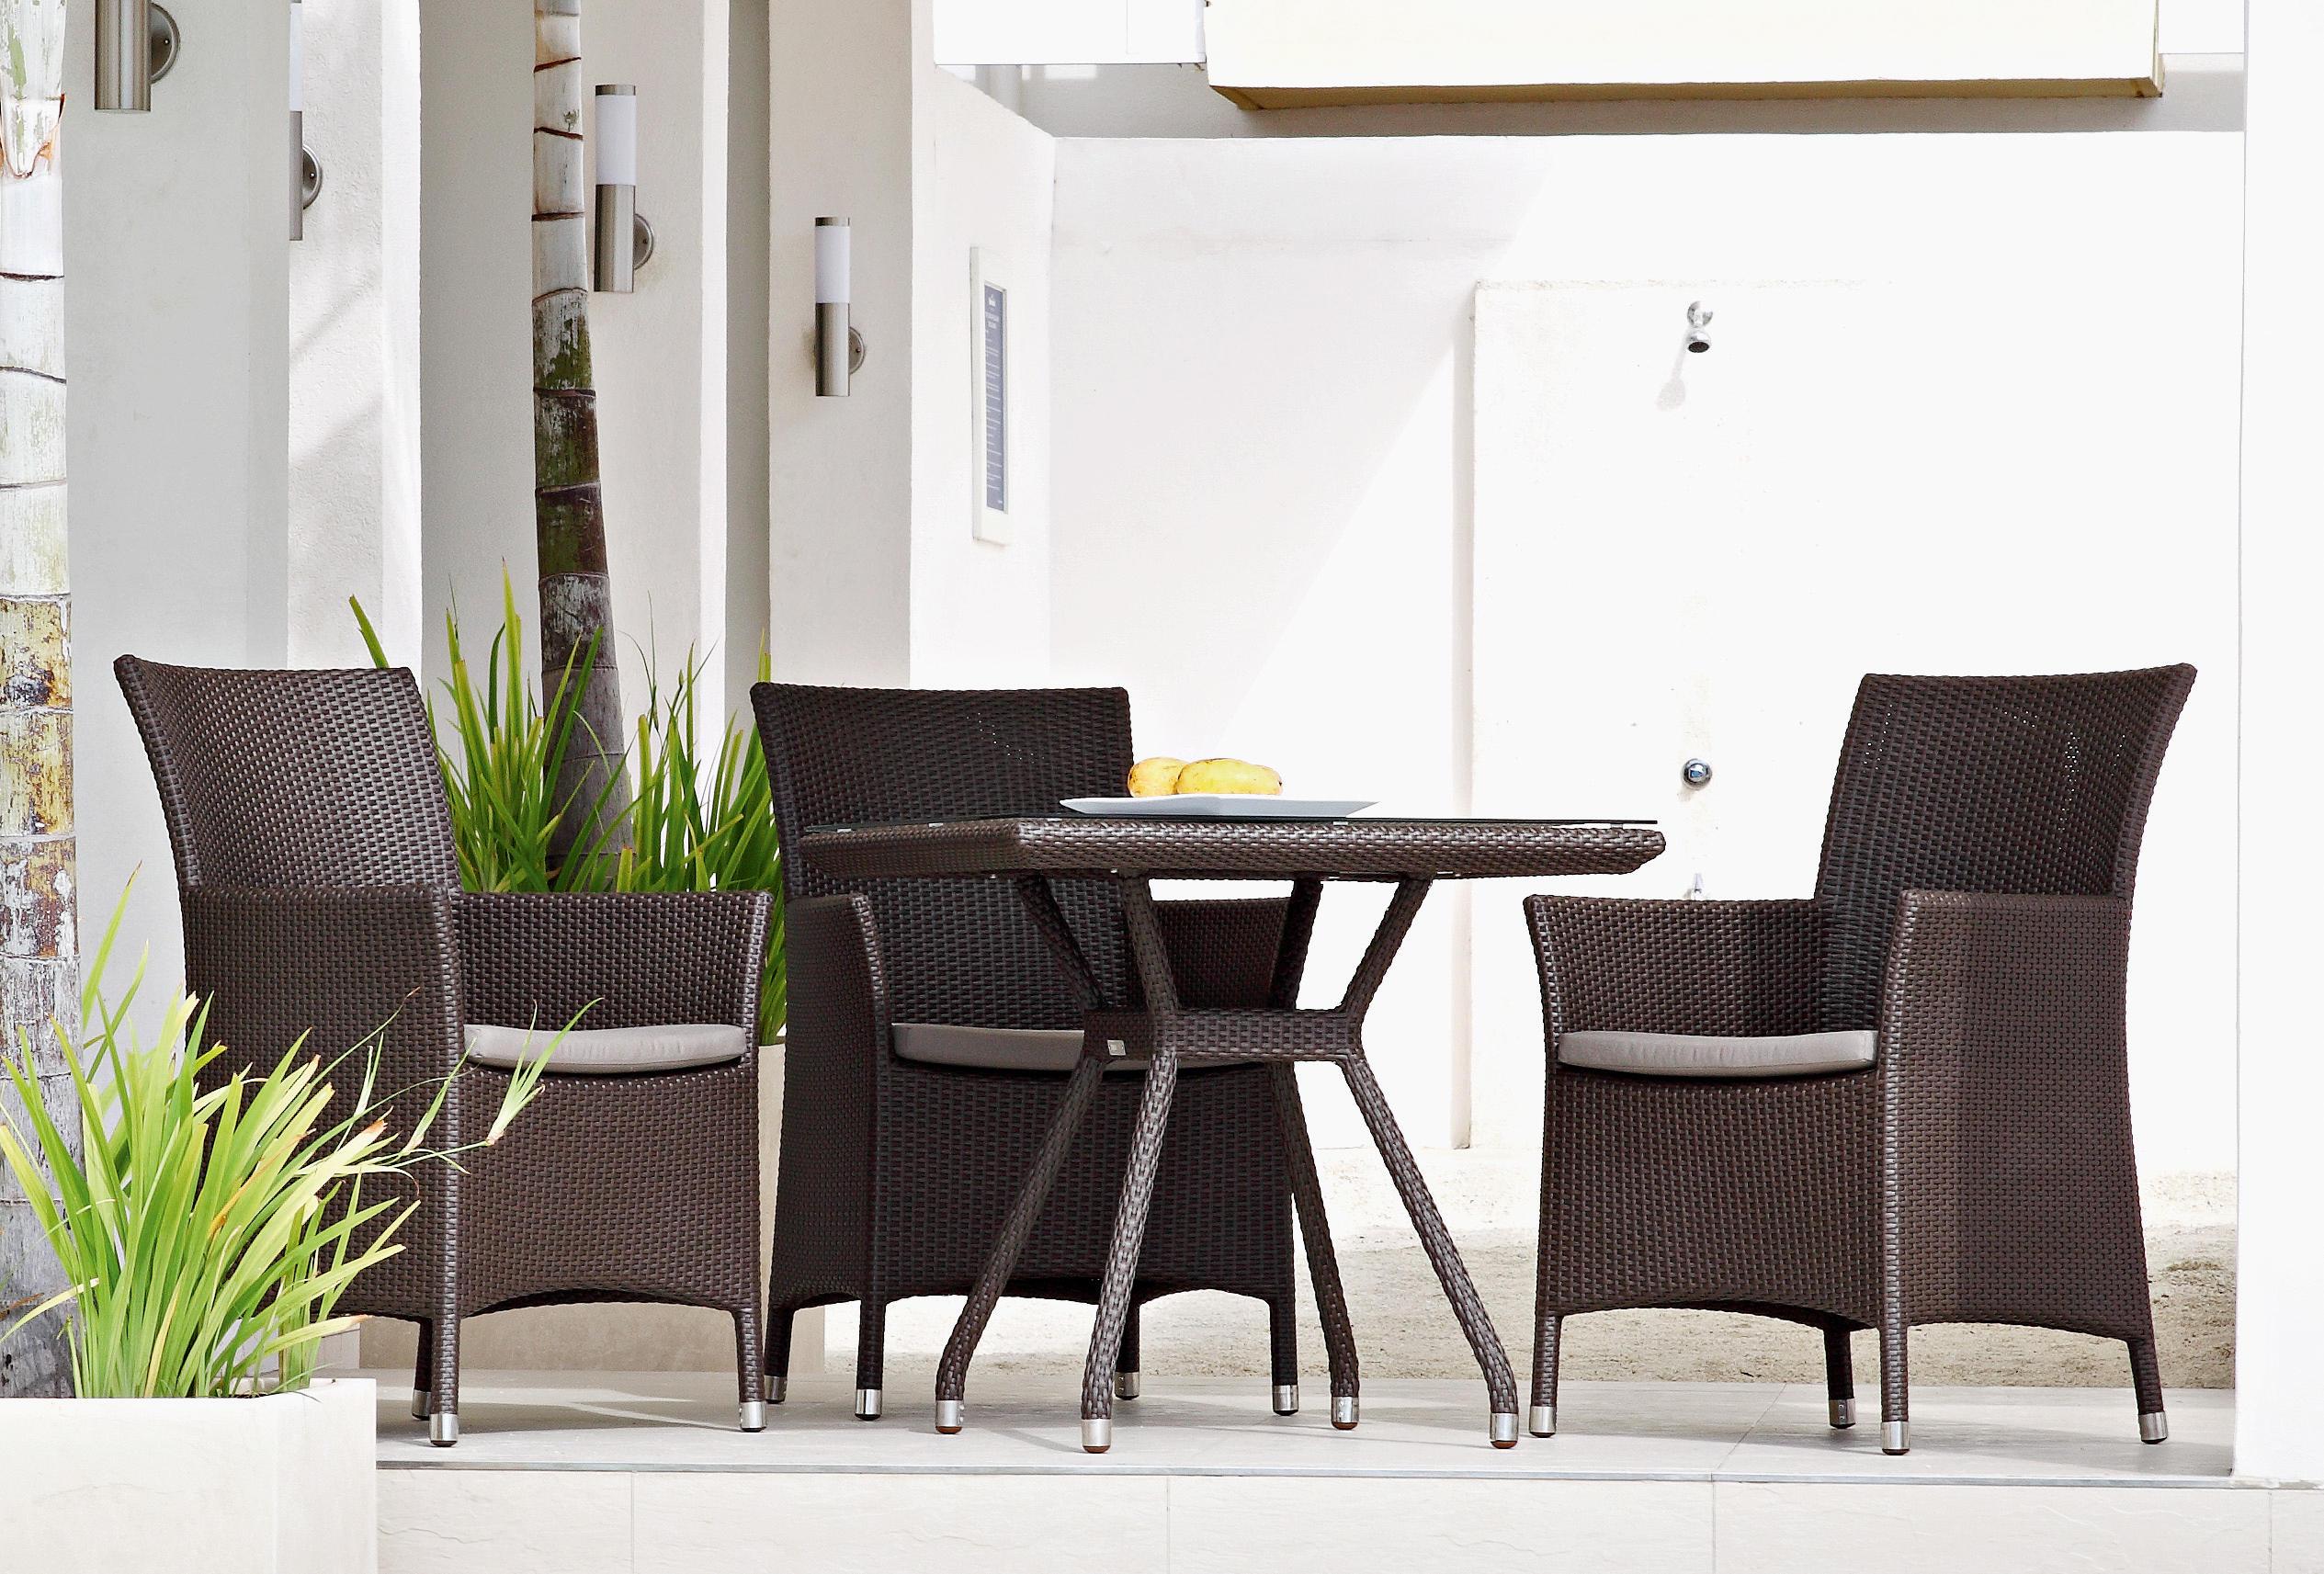 FLORIDA STAPELSTUHL - Stühle von Rausch Classics | Architonic